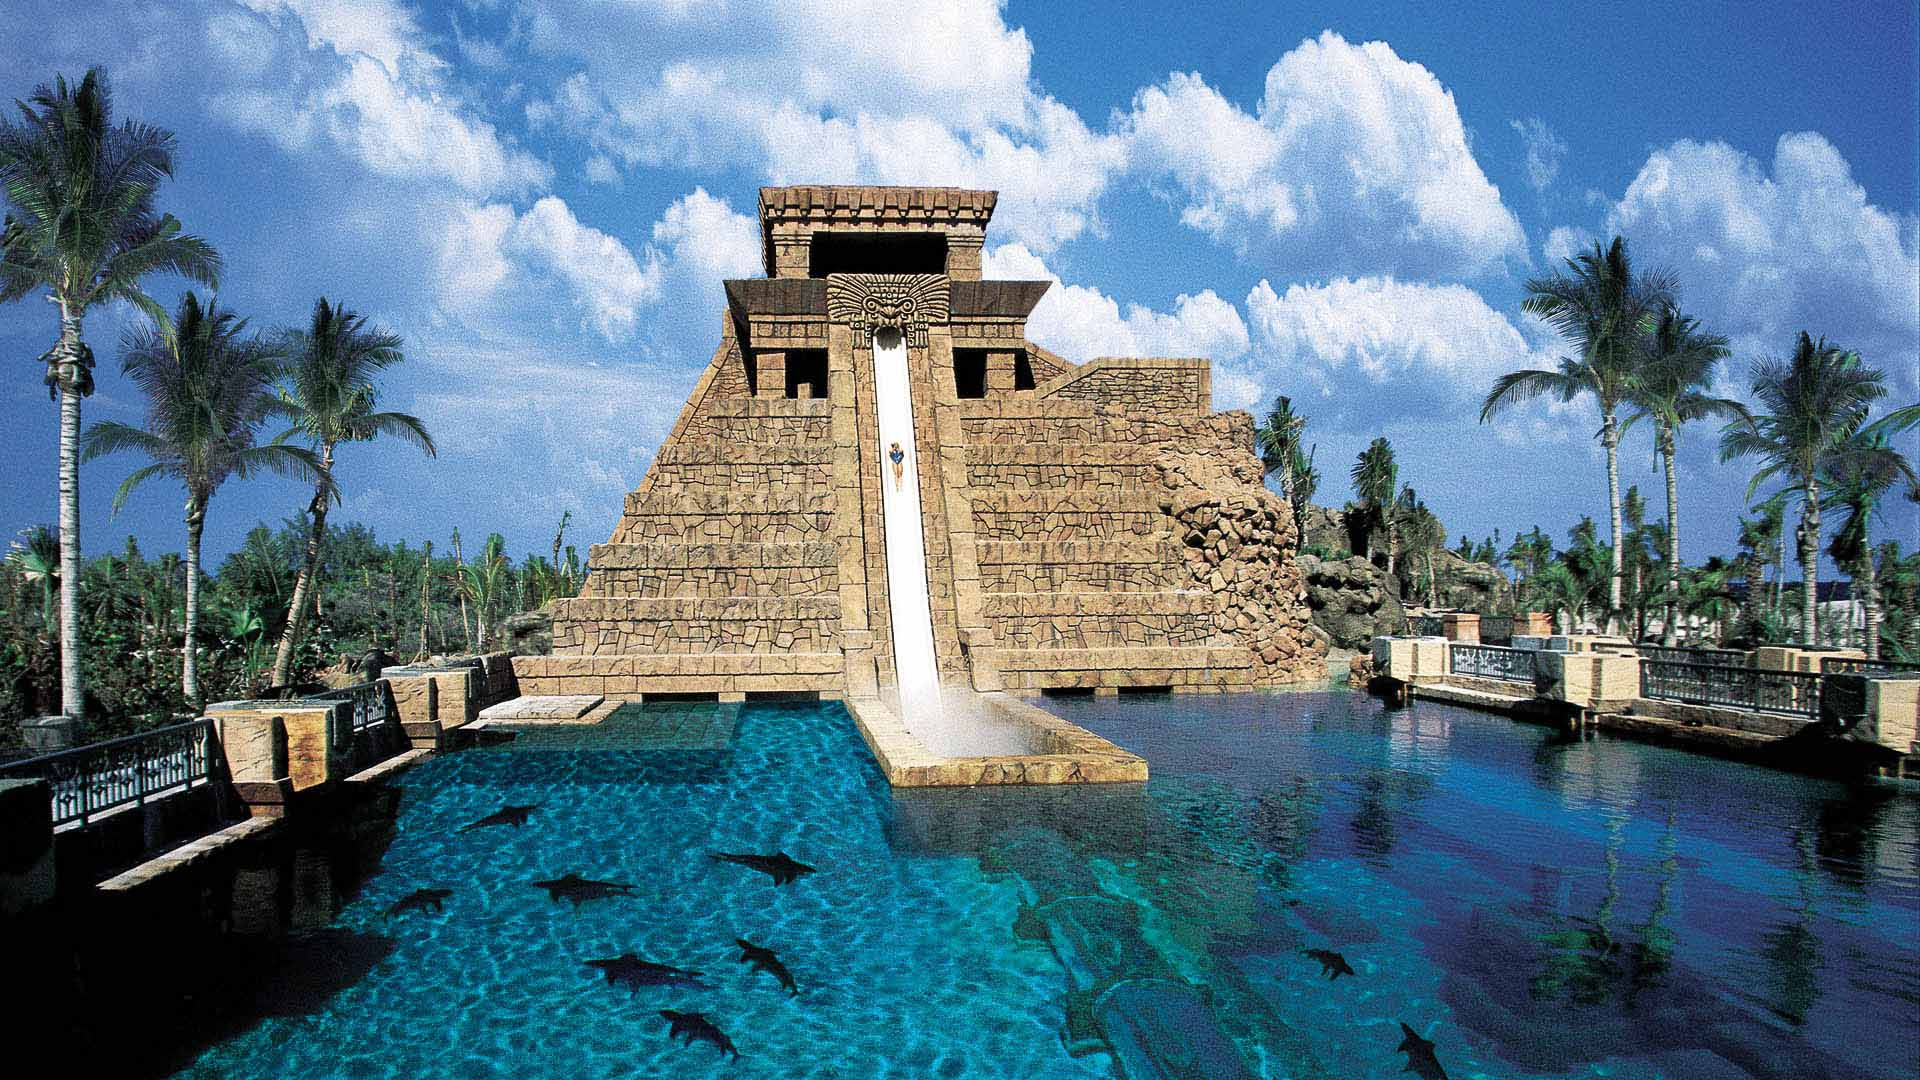 Aquaventure, Leap of Faith, water slide